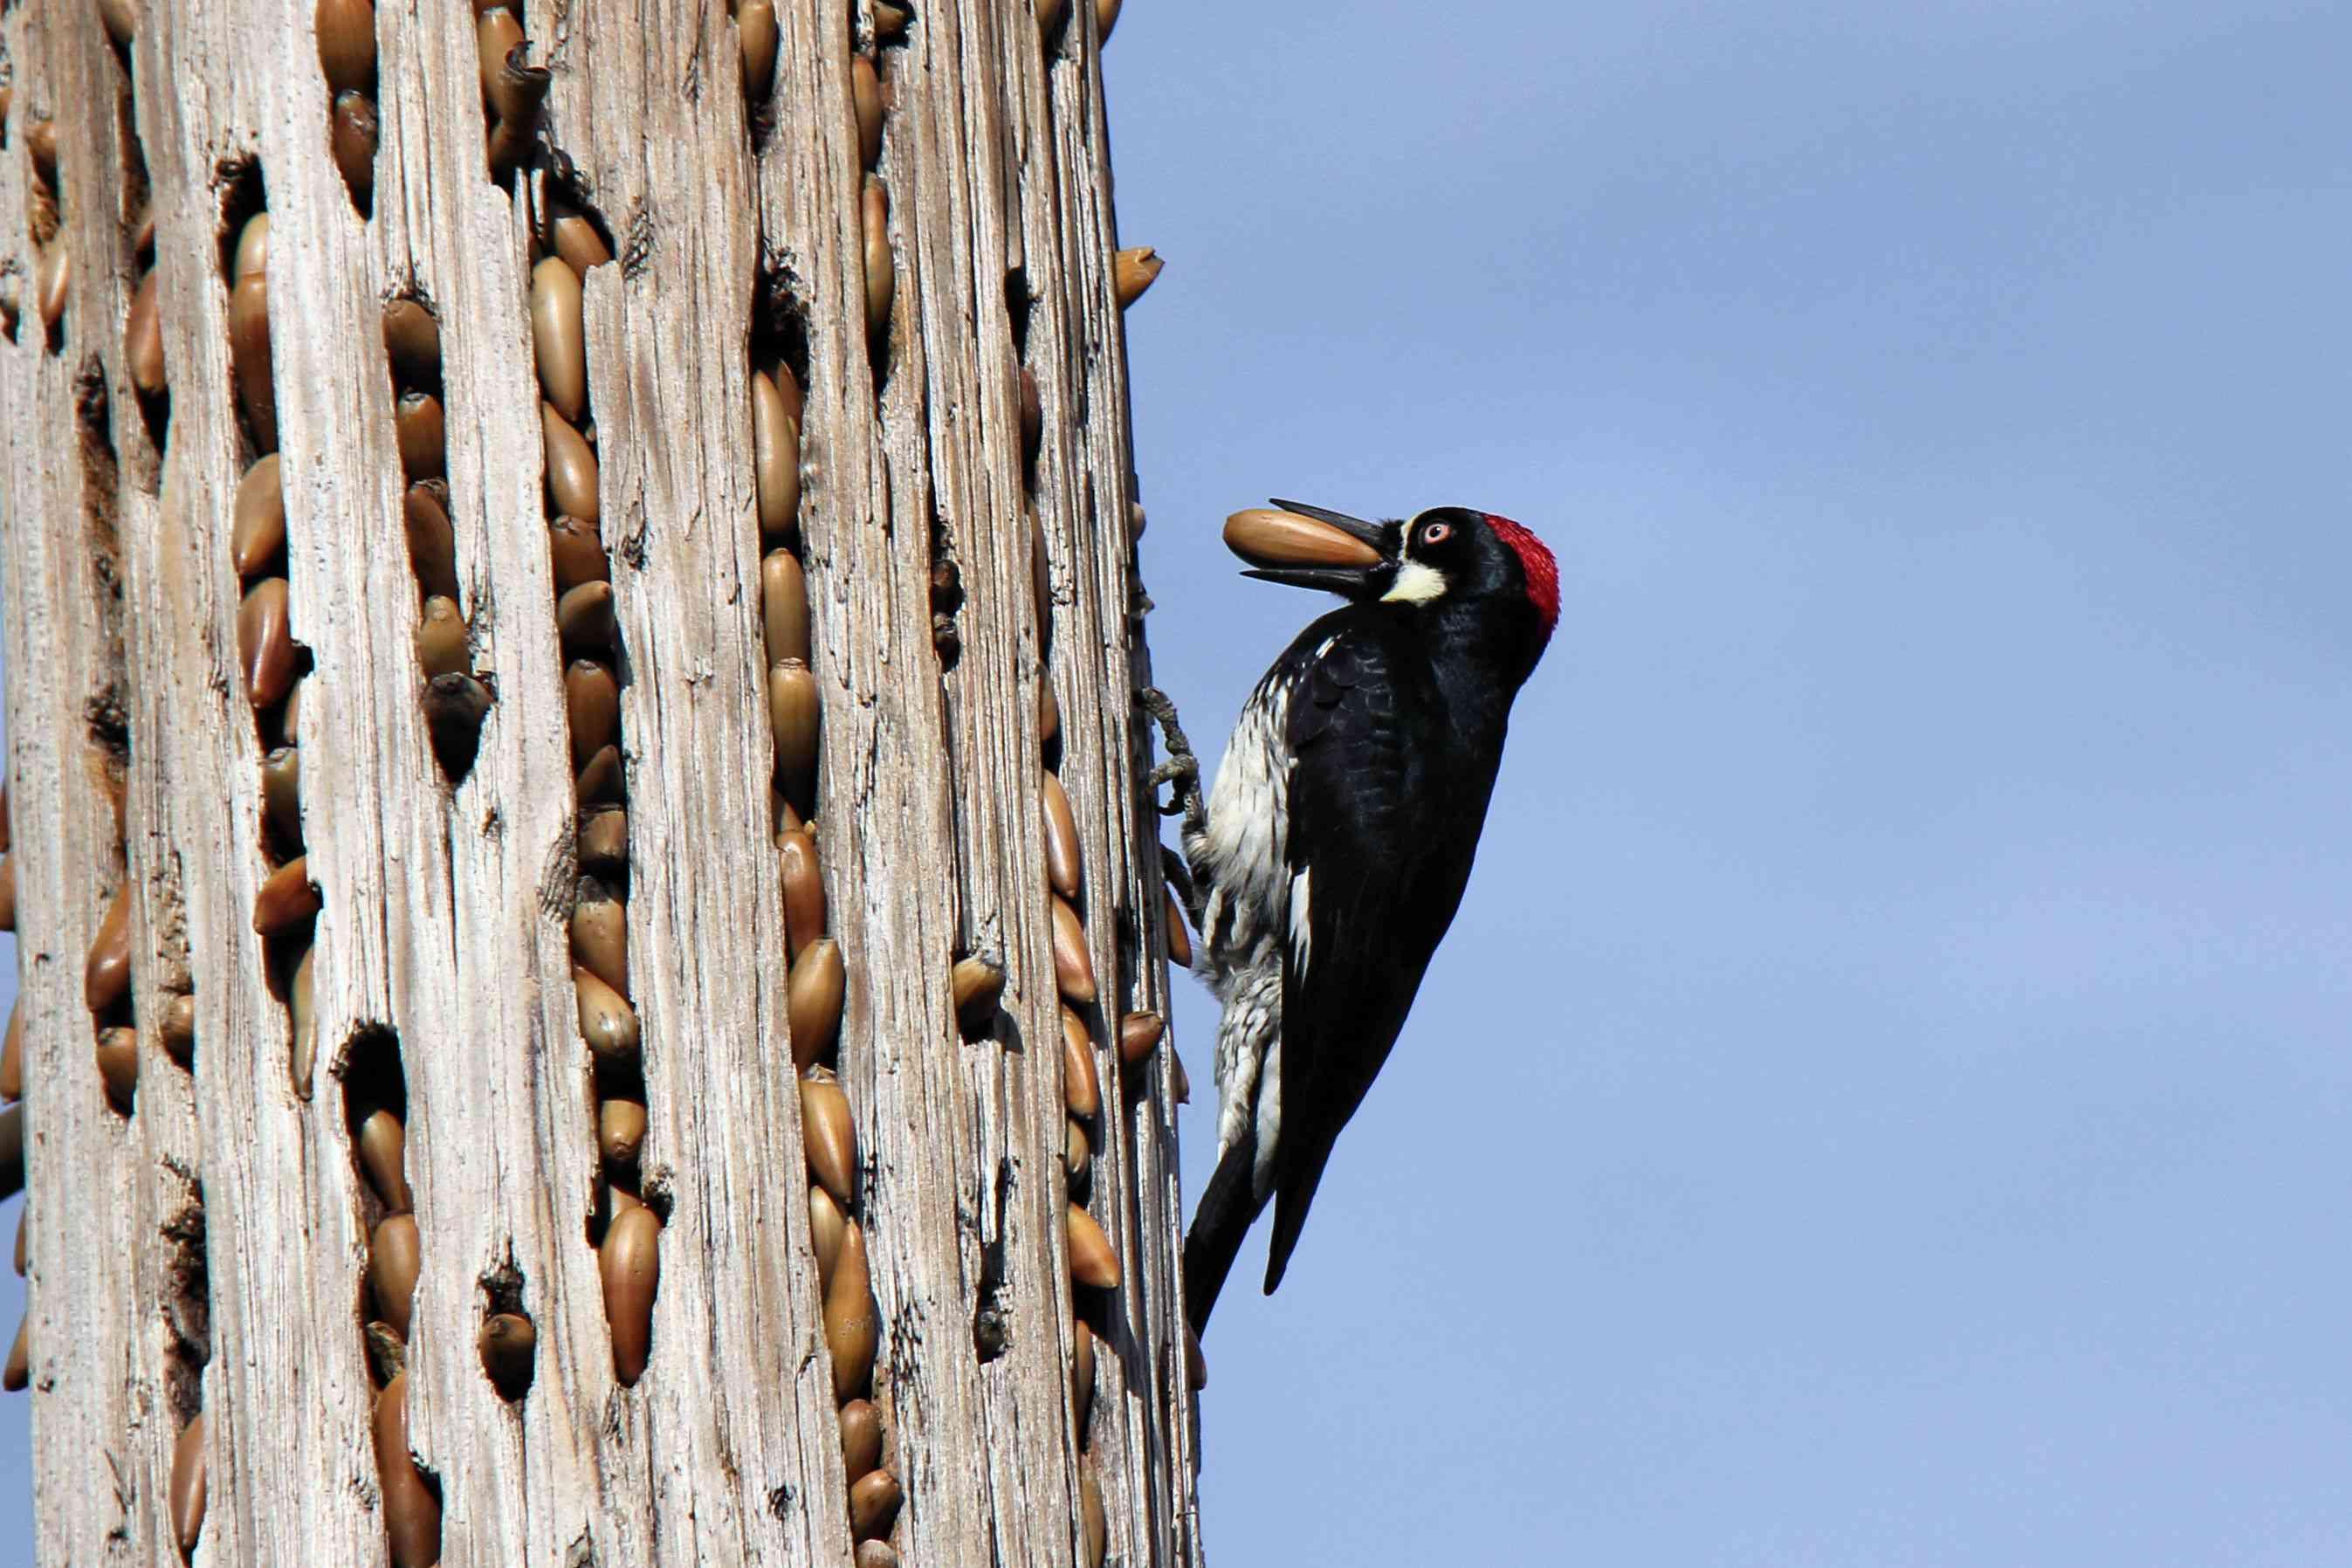 An acorn woodpecker filling a granary tree.